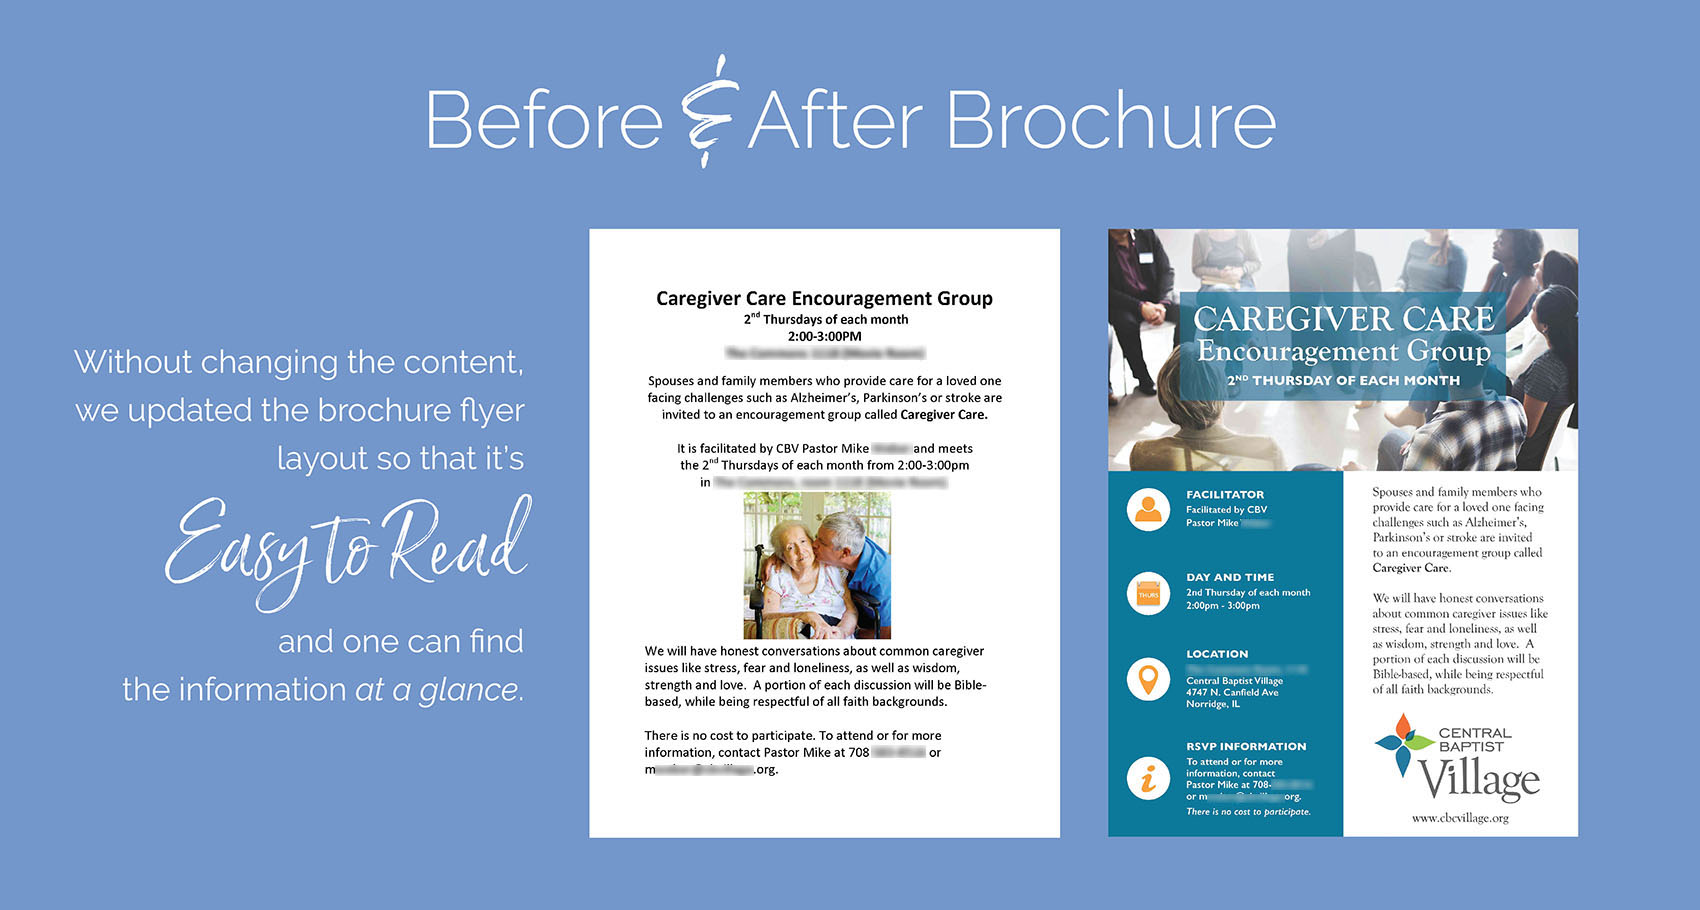 Before & After Brochure Design by Eclectik Design